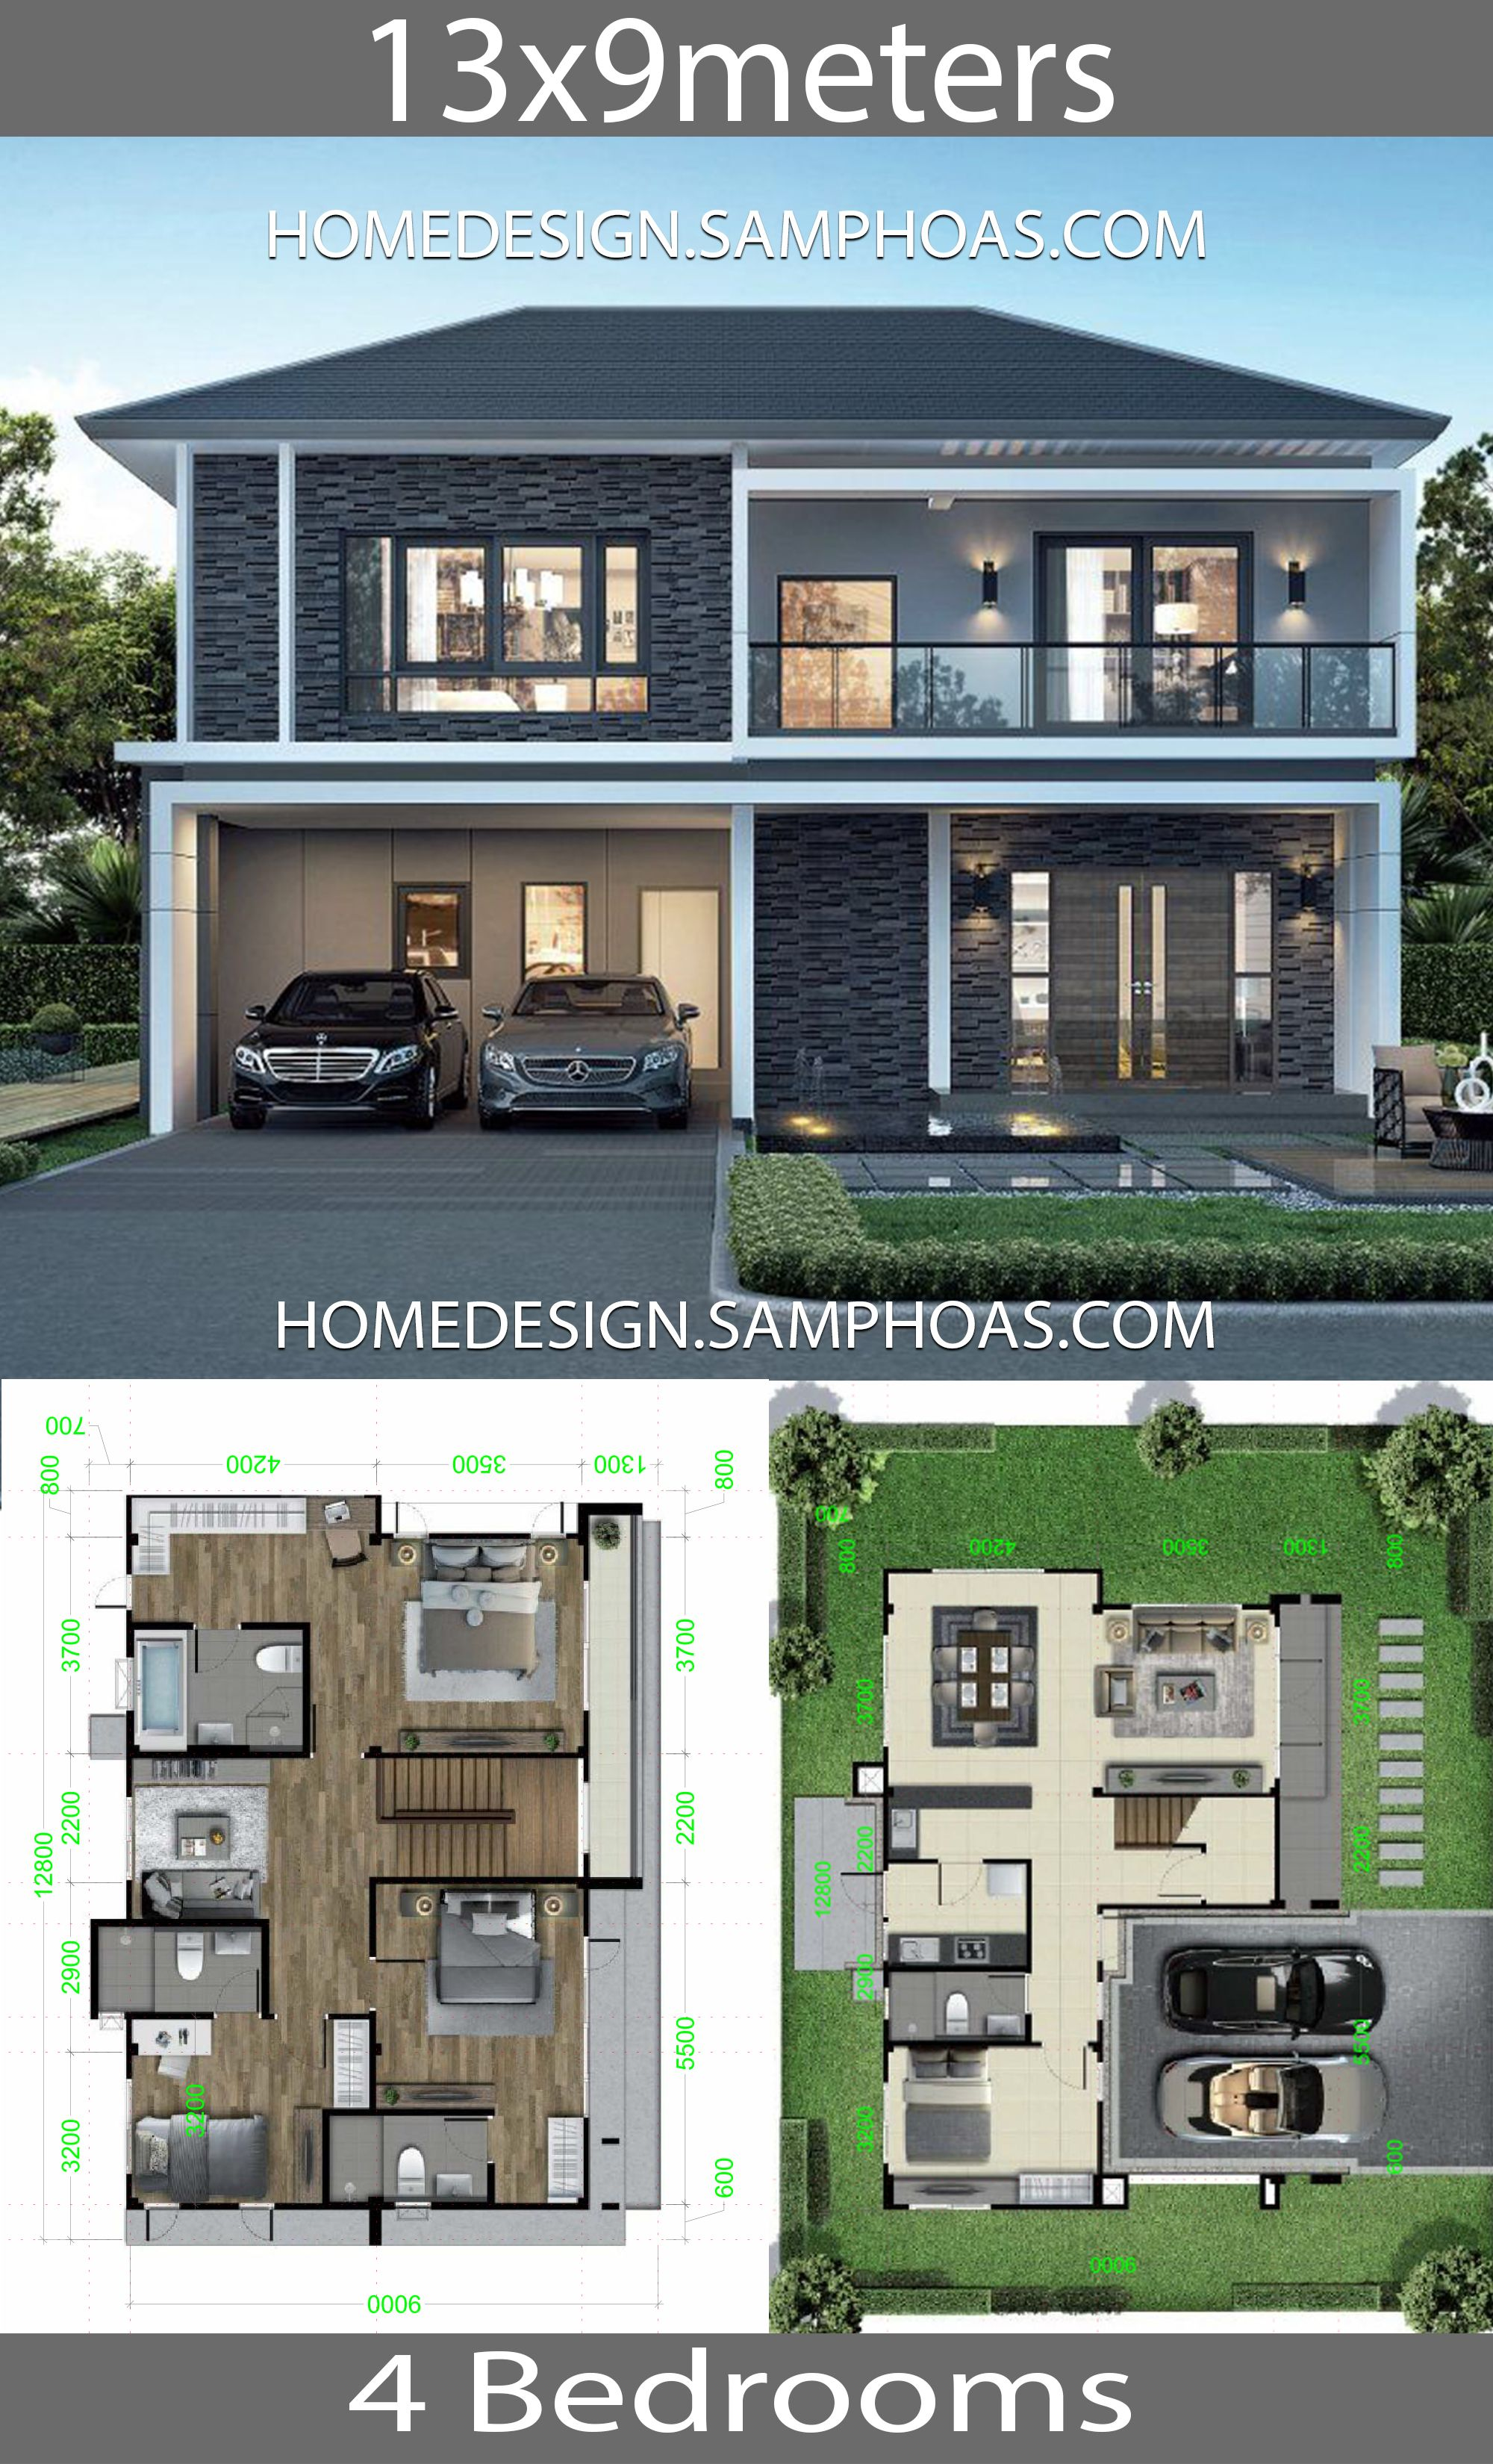 10 Best House Design Plans With Floor Plans House Plans 3d Desain Rumah 2 Lantai Tata Letak Rumah Denah Rumah 3d